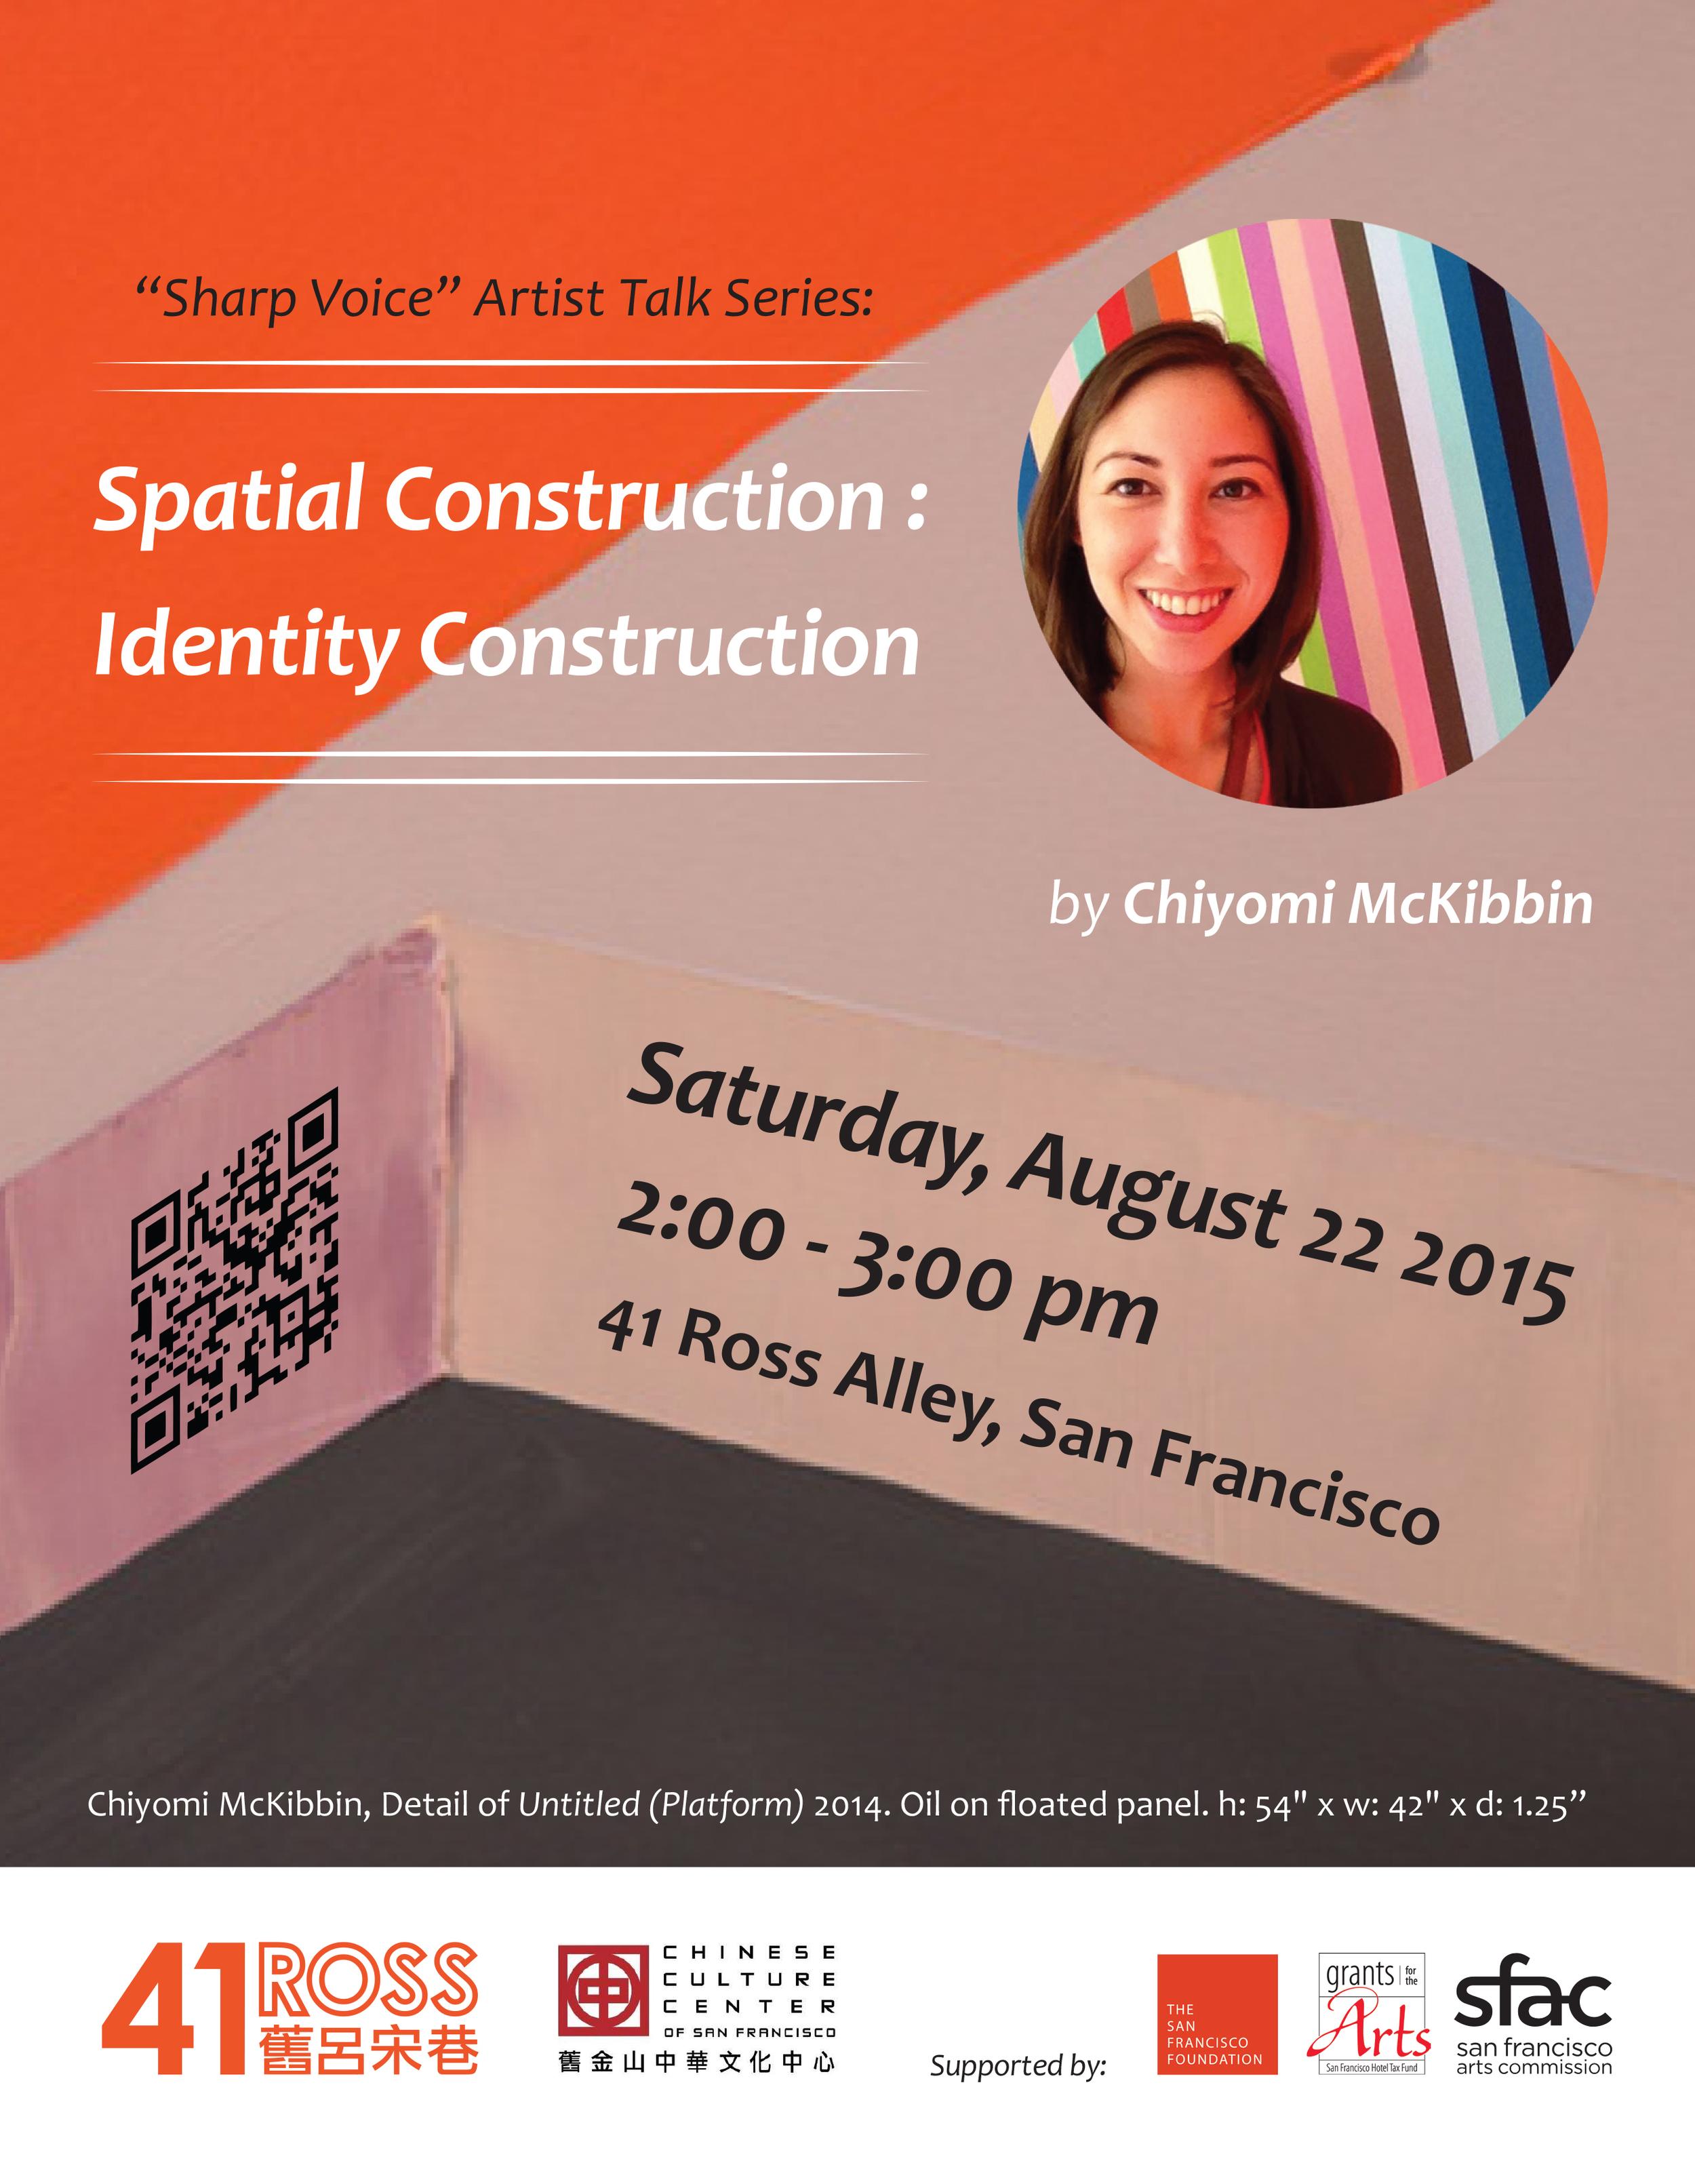 Poster for artist Chiyomi McKibbin's talk.